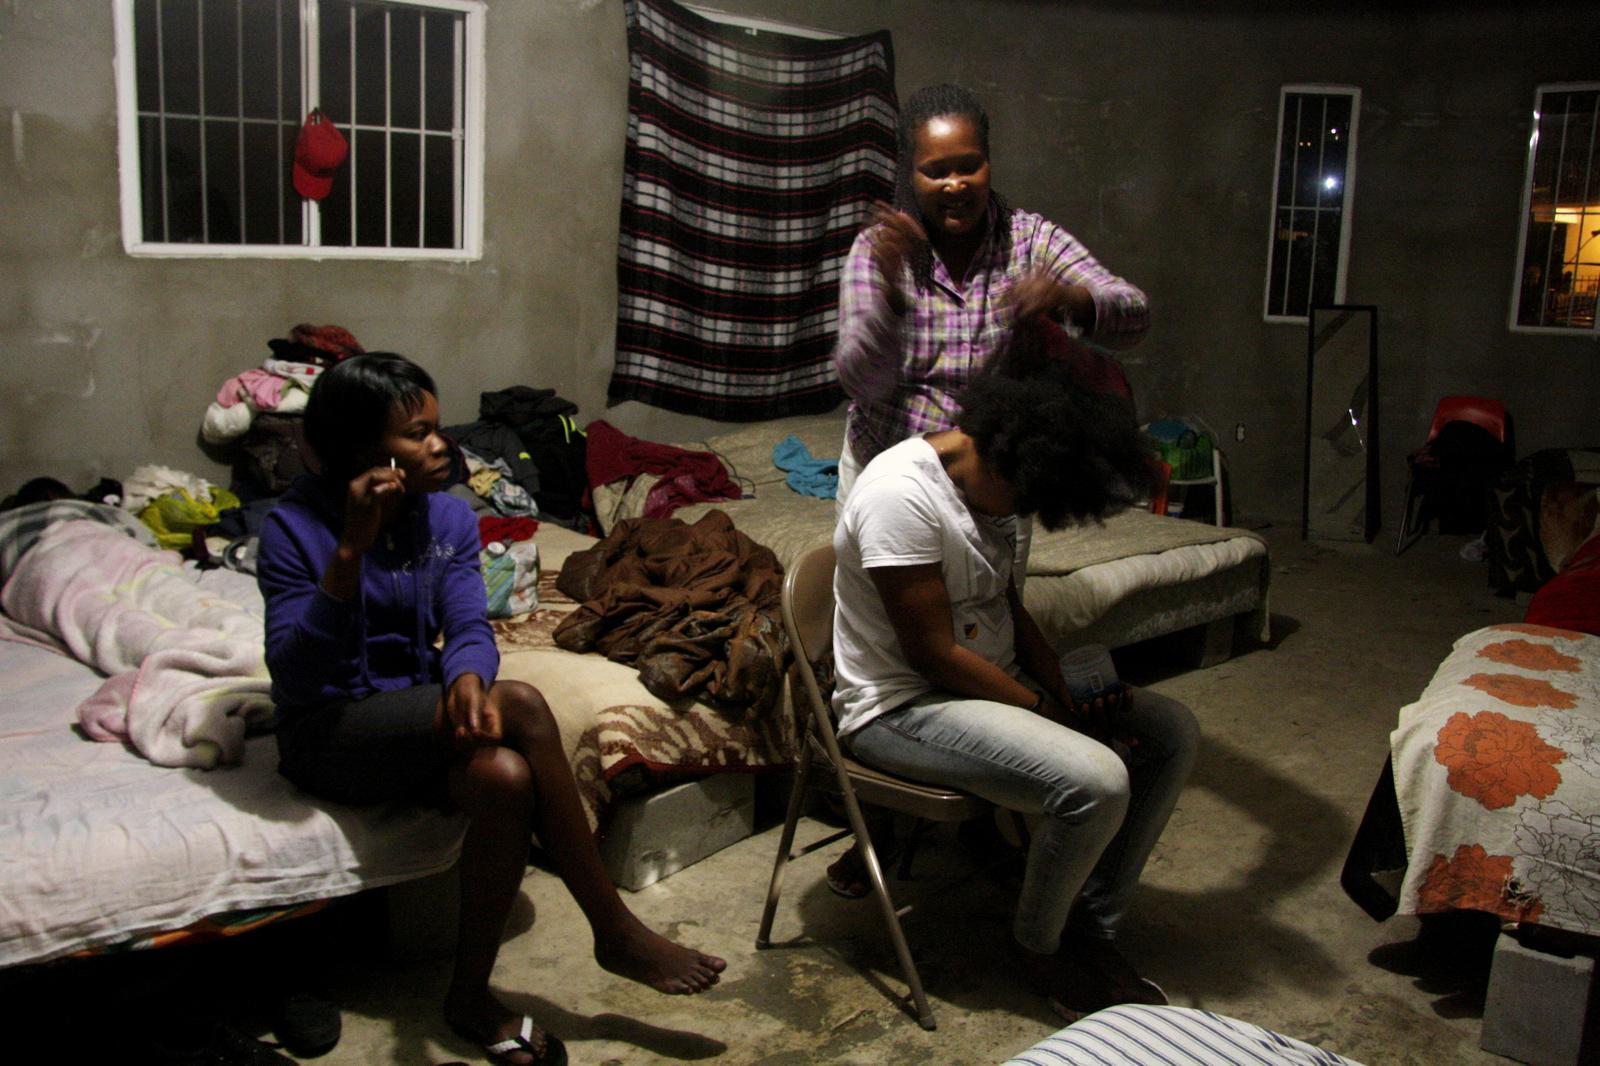 Haitian refugees at a shelter in Tijuana, Mexico. Benjamin Preston—The Drive